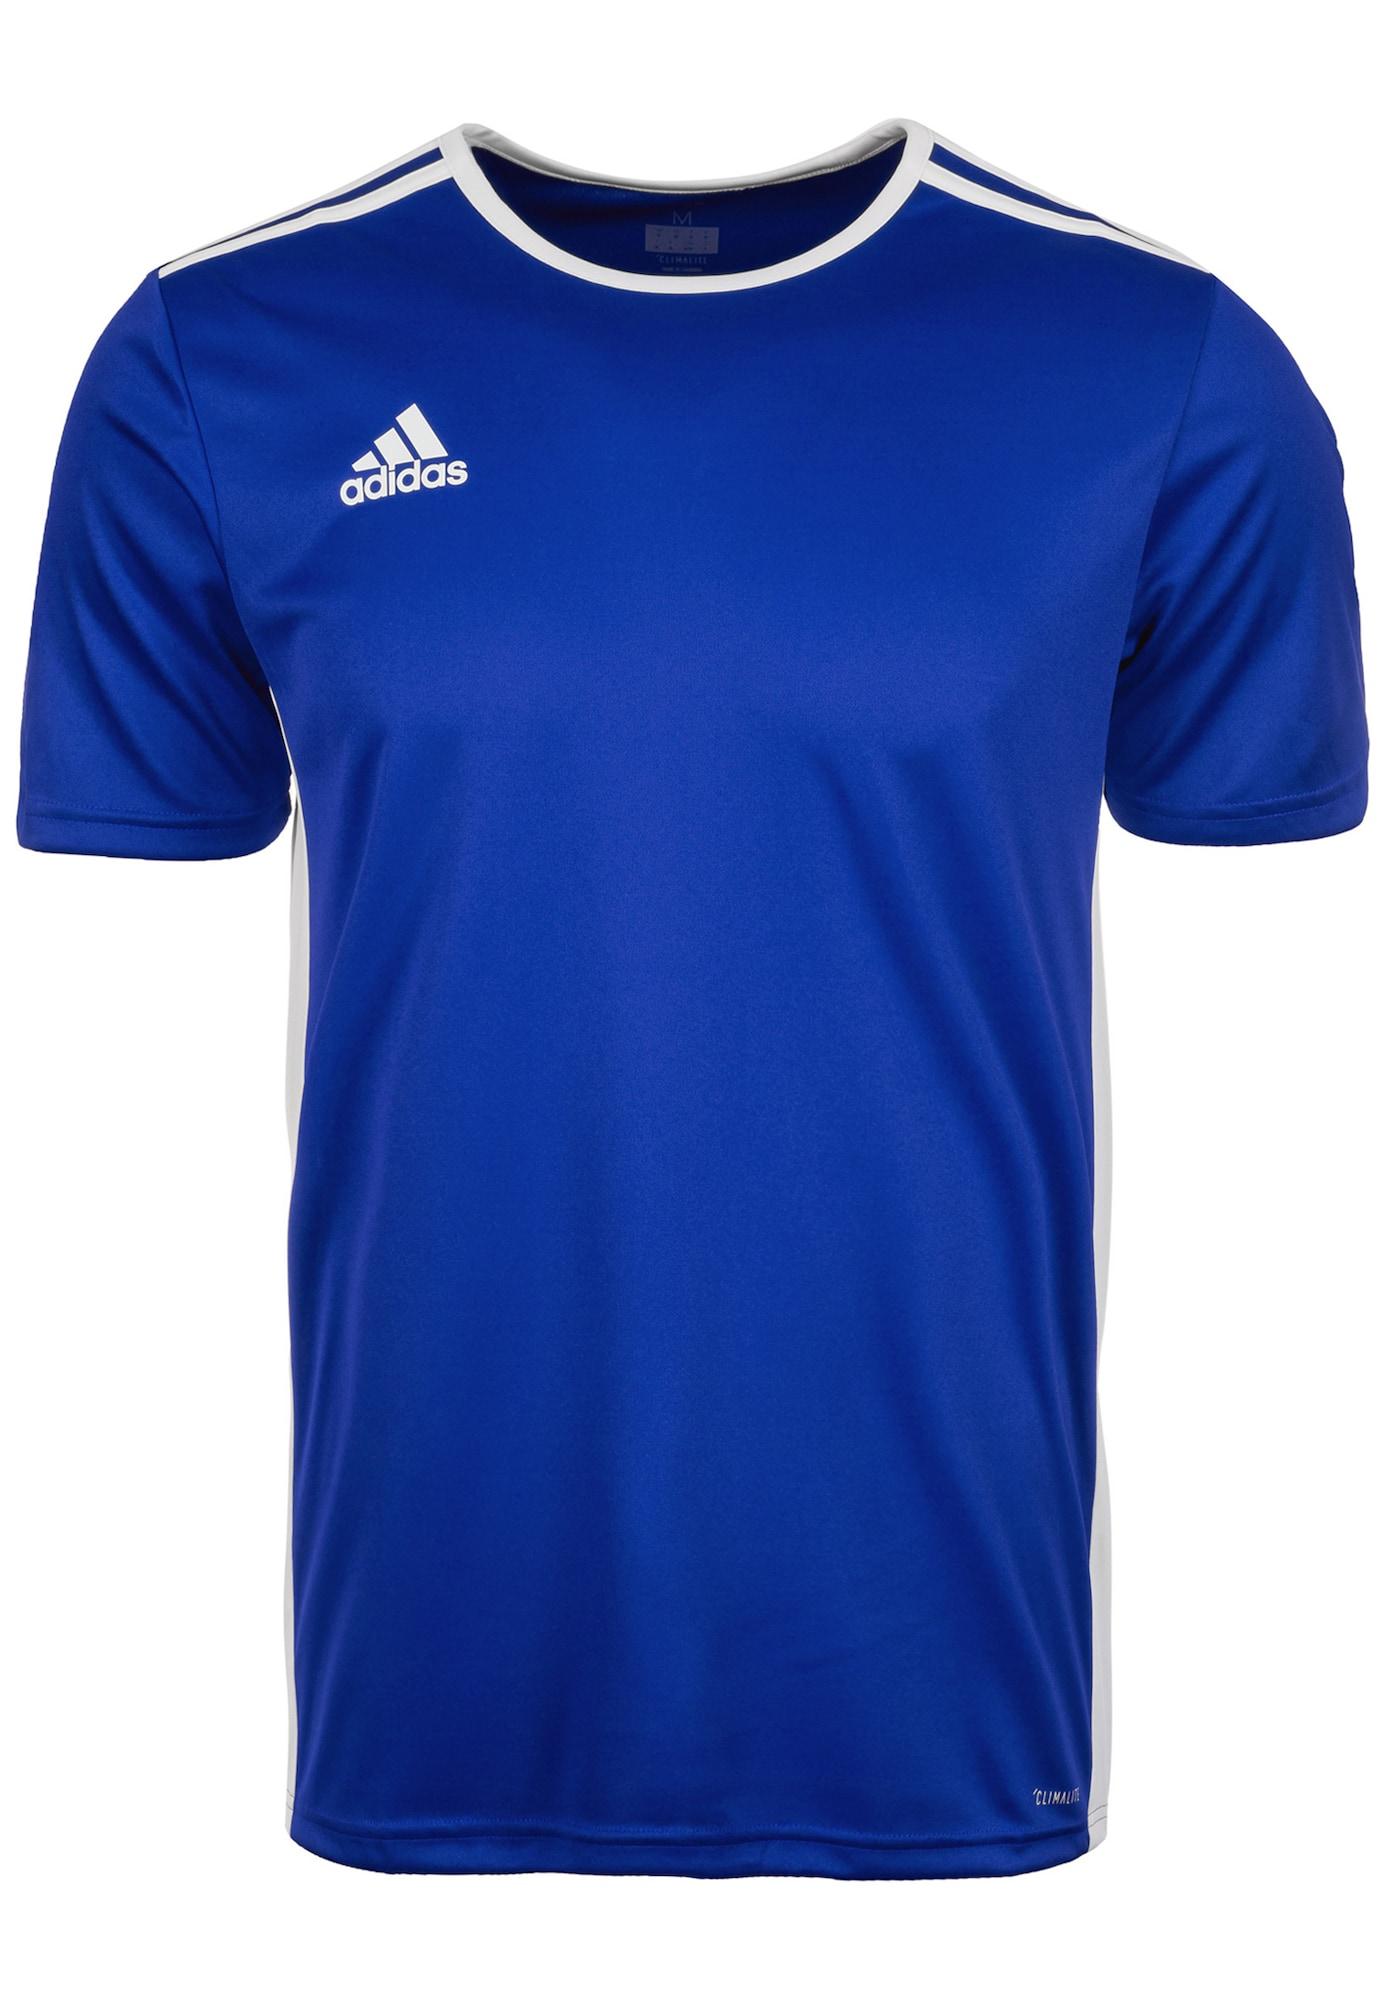 Fußballtrikot 'Entrada 18'   Sportbekleidung > Trikots > Fußballtrikots   adidas performance